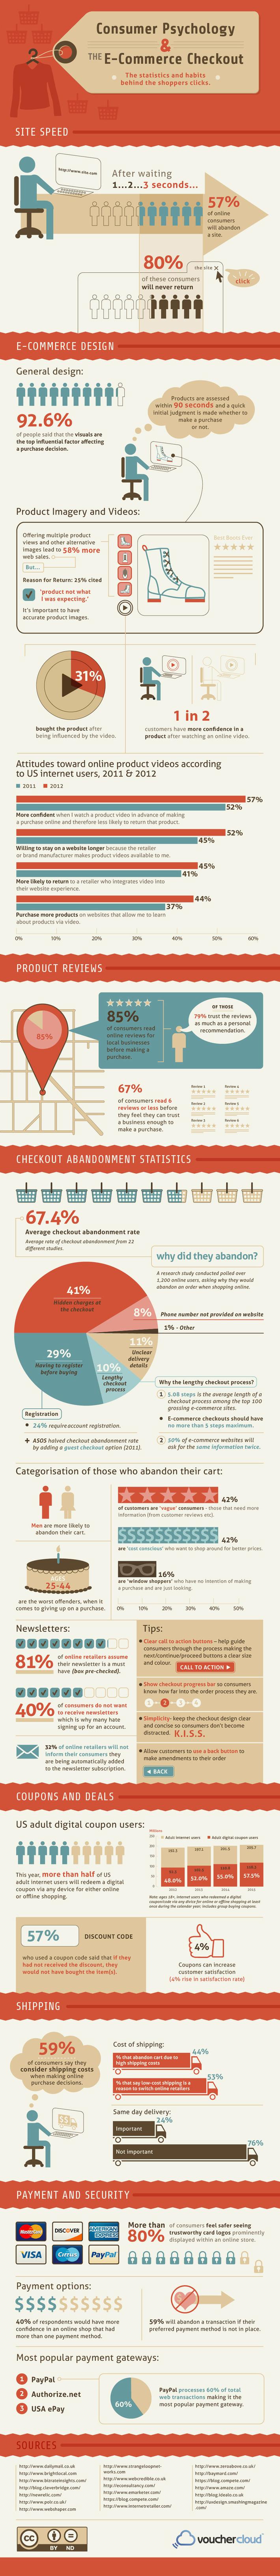 Consumer Psychology & the E-Commerce Checkout | Consumption Junction | Scoop.it